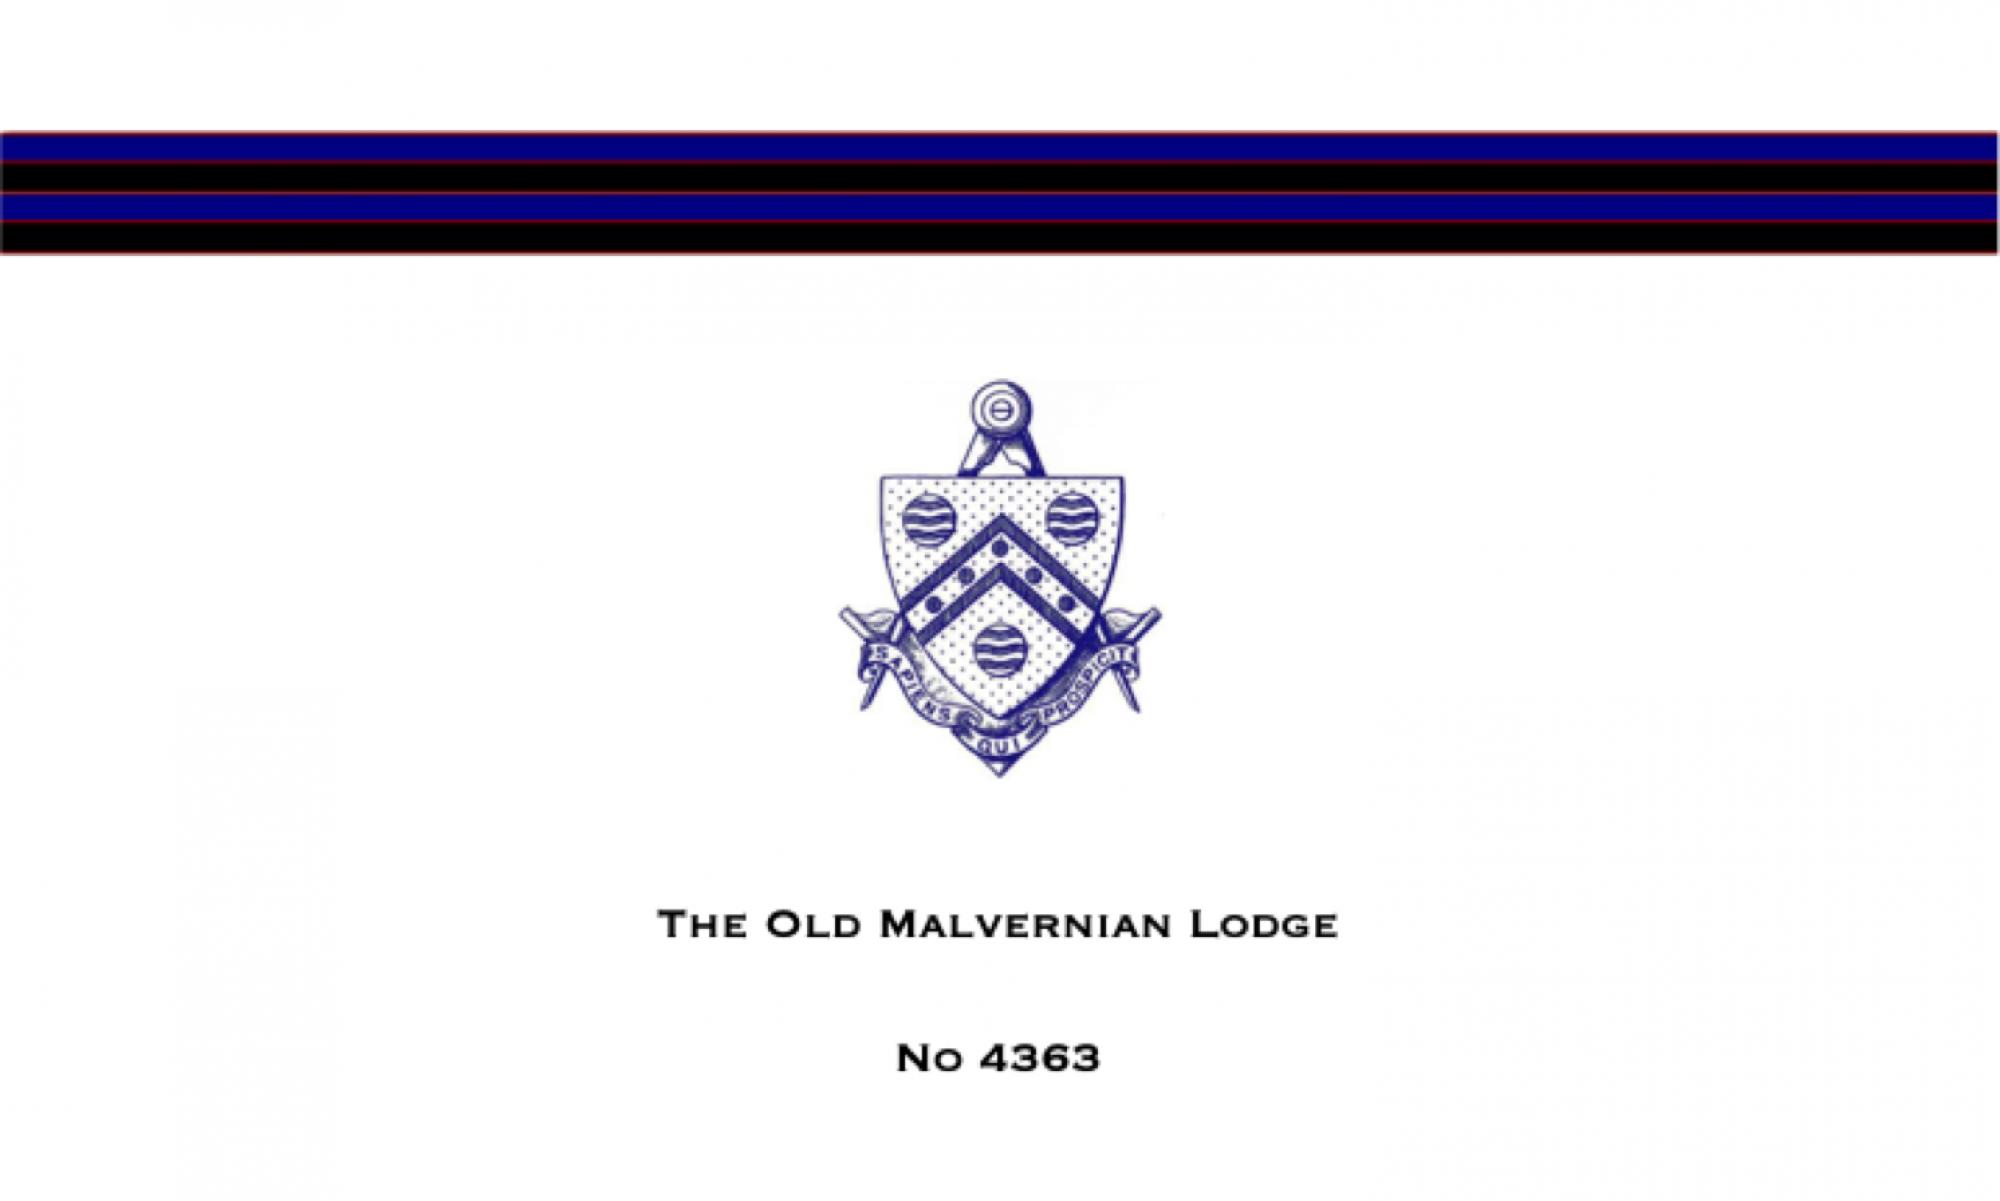 Old Malvernian Lodge No 4363